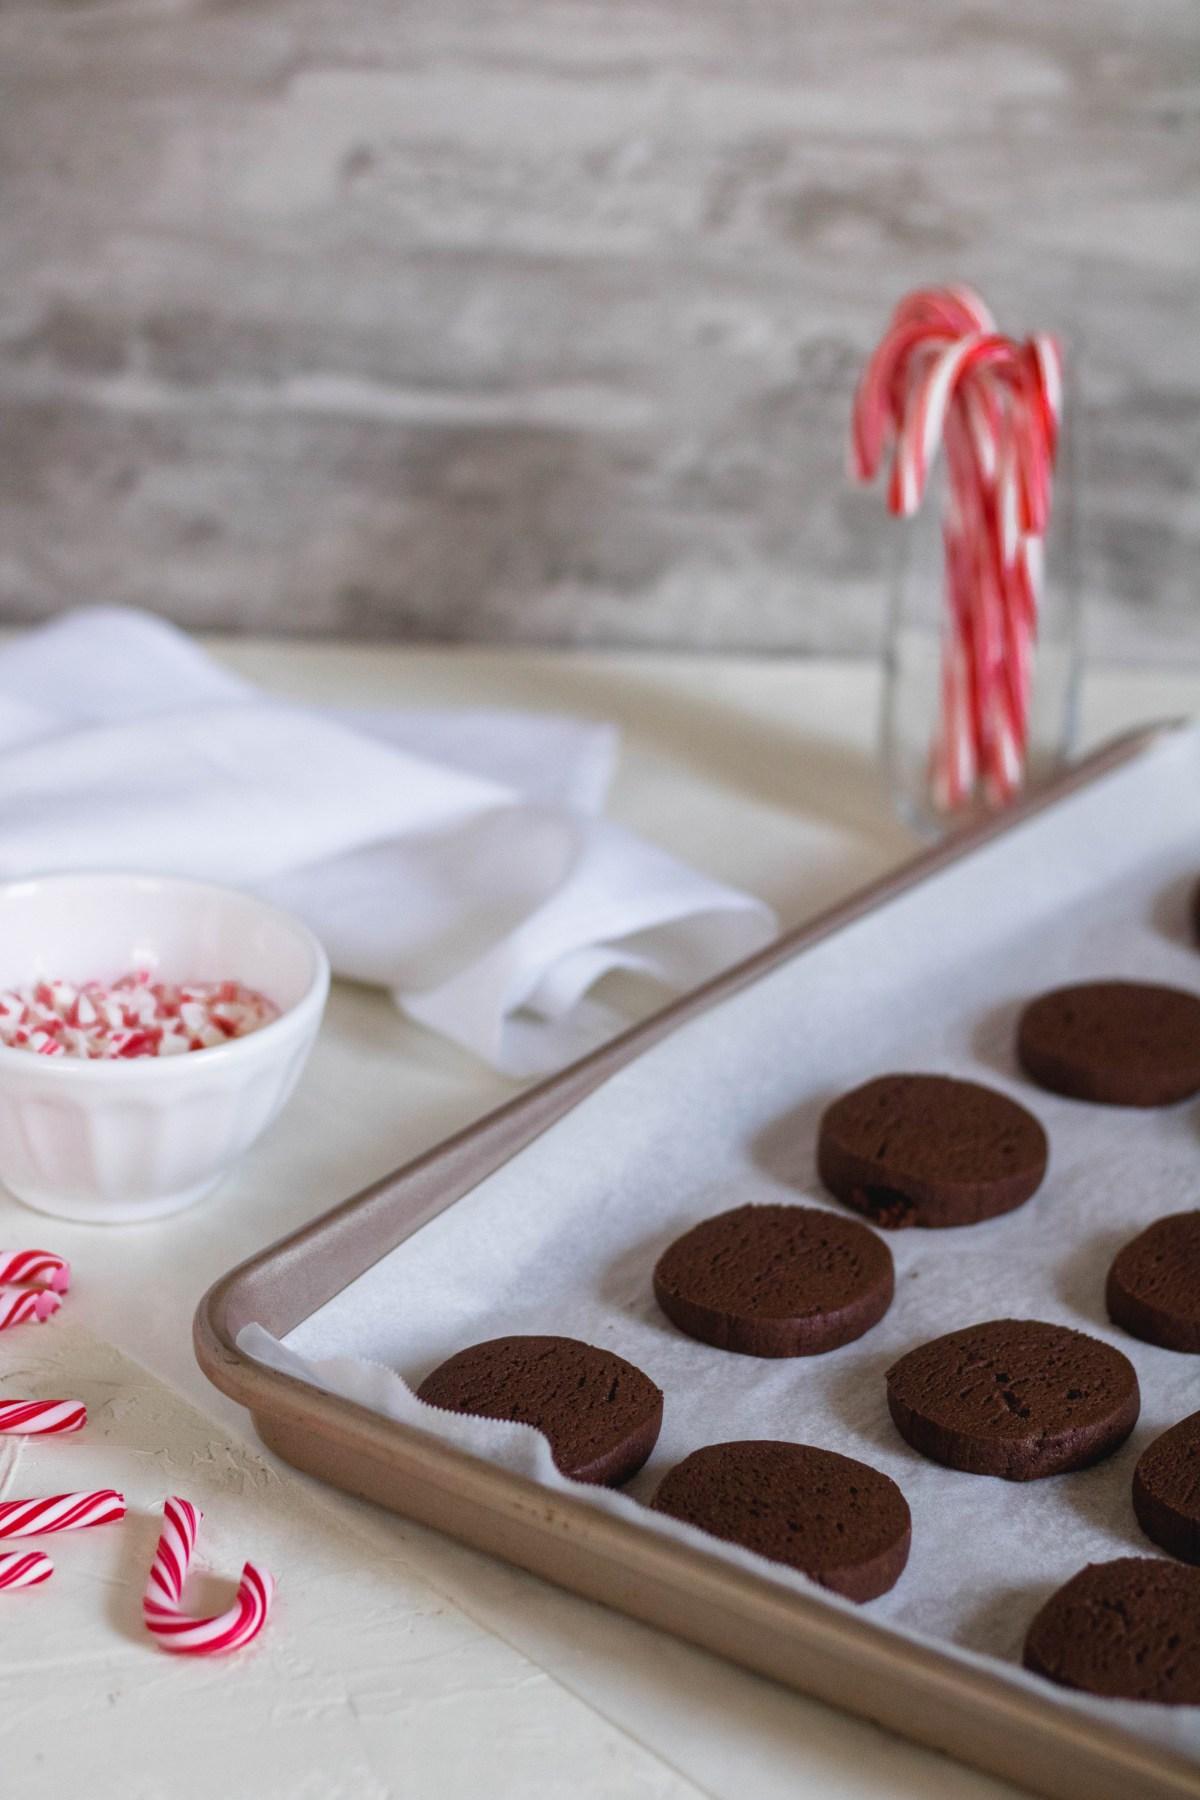 Baking chocolate peppermint crunch slice and bake cookiesa